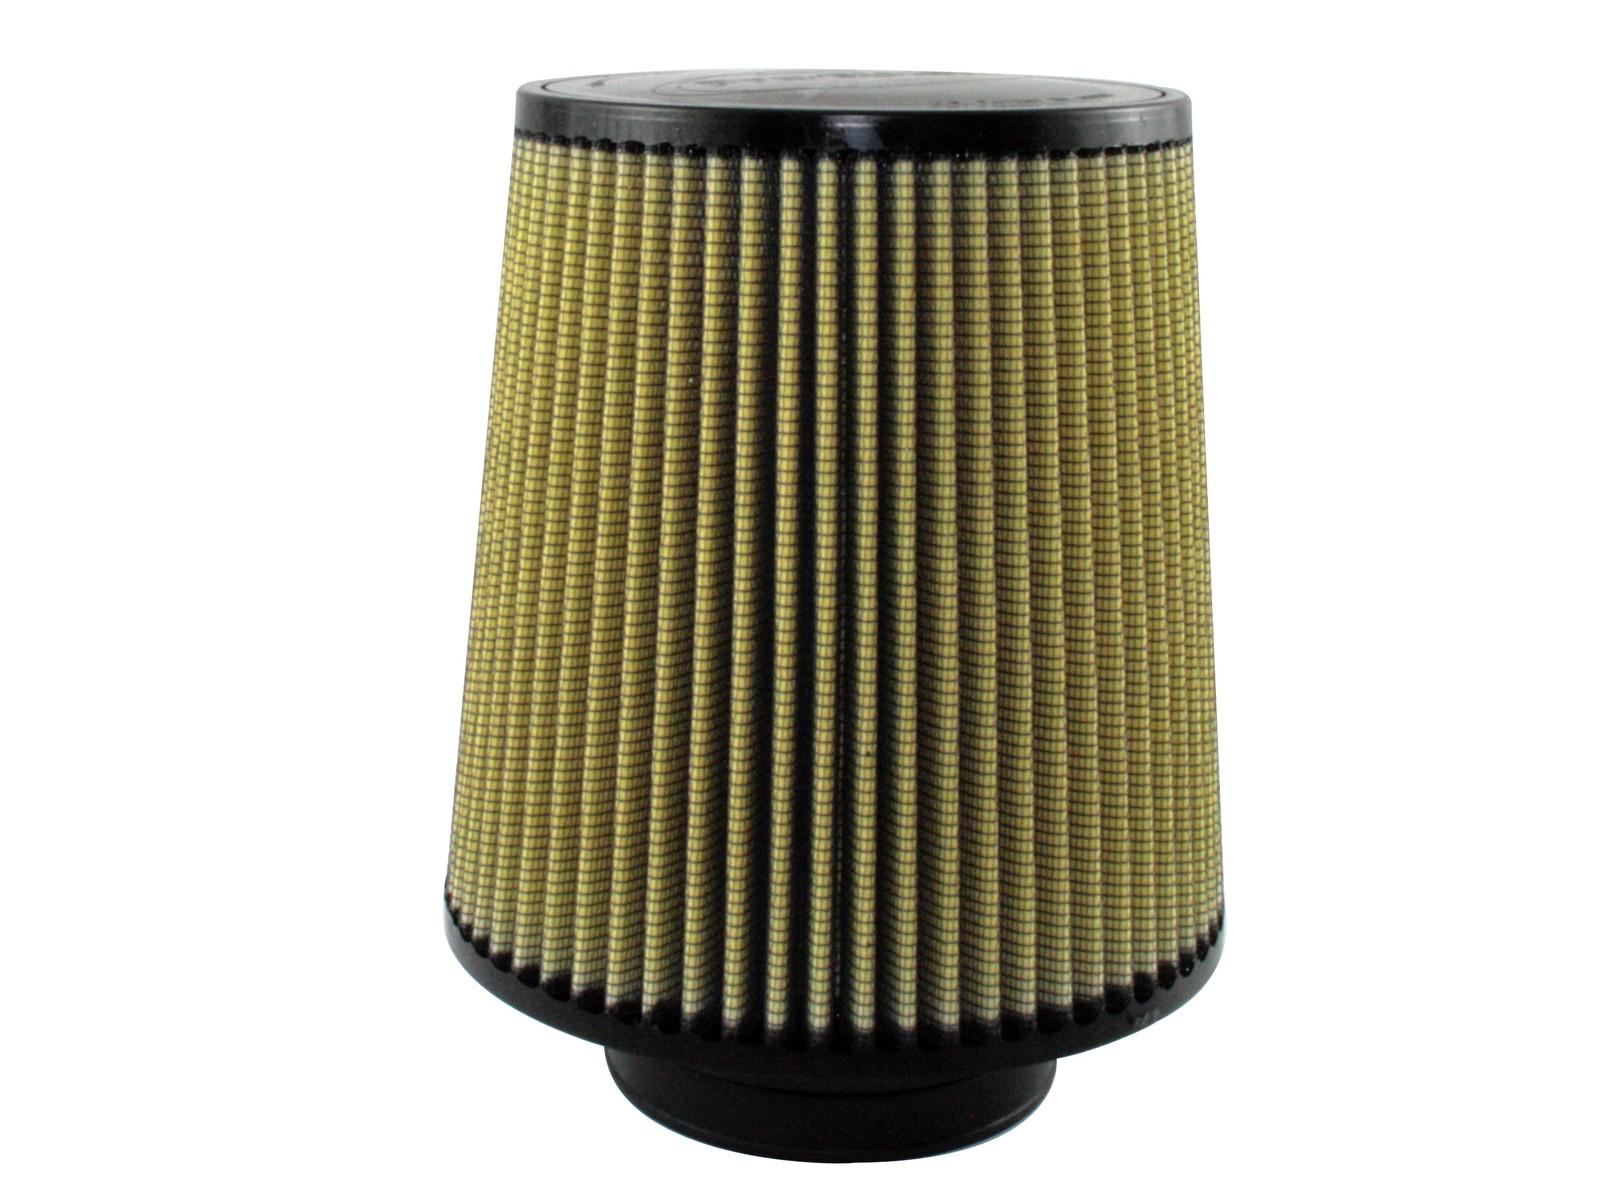 aFe POWER 72-90010 Magnum FLOW Pro GUARD7 Air Filter